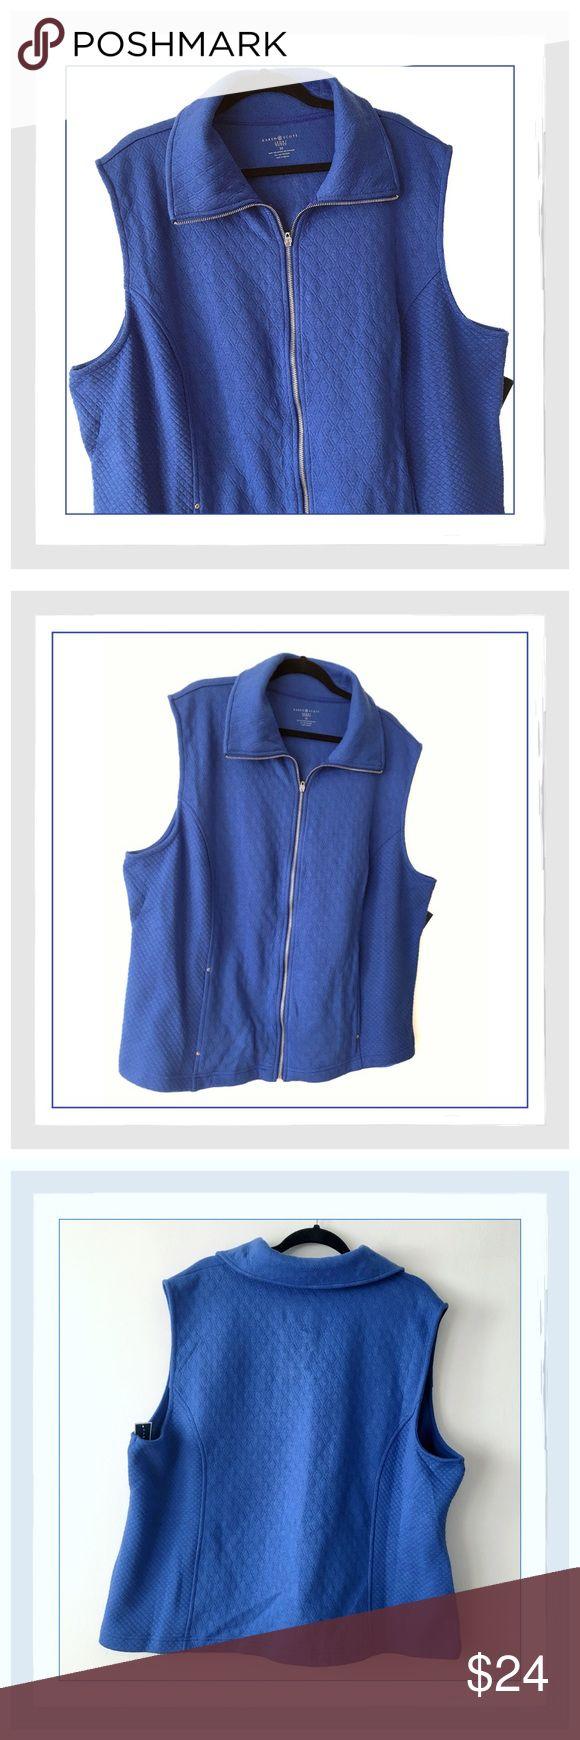 ✨{Plus} Karen Scott Sport Quilted Vest✨ ✨{Plus} Karen Scott Sport Quilted Vest✨Great Vest To Warm Your Core When You Just Need A Little More✨Fabric: Cotton/Polyester✨2 Front Zippered Pockets✨Color Is Pacific Blue✨NWT✨Size 3X✨ Karen Scott Jackets & Coats Vests